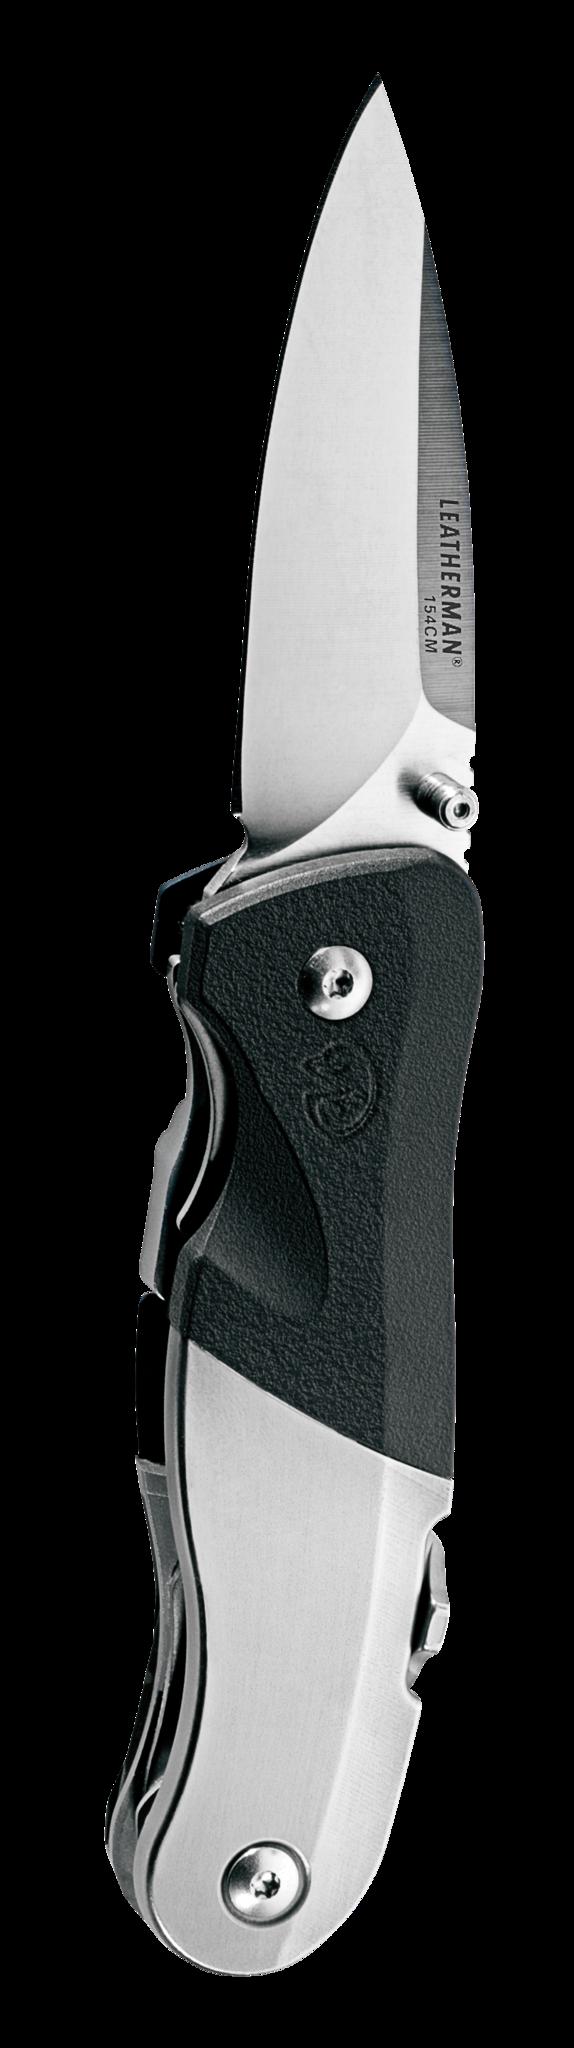 Нож Leatherman е33B, 3 функции